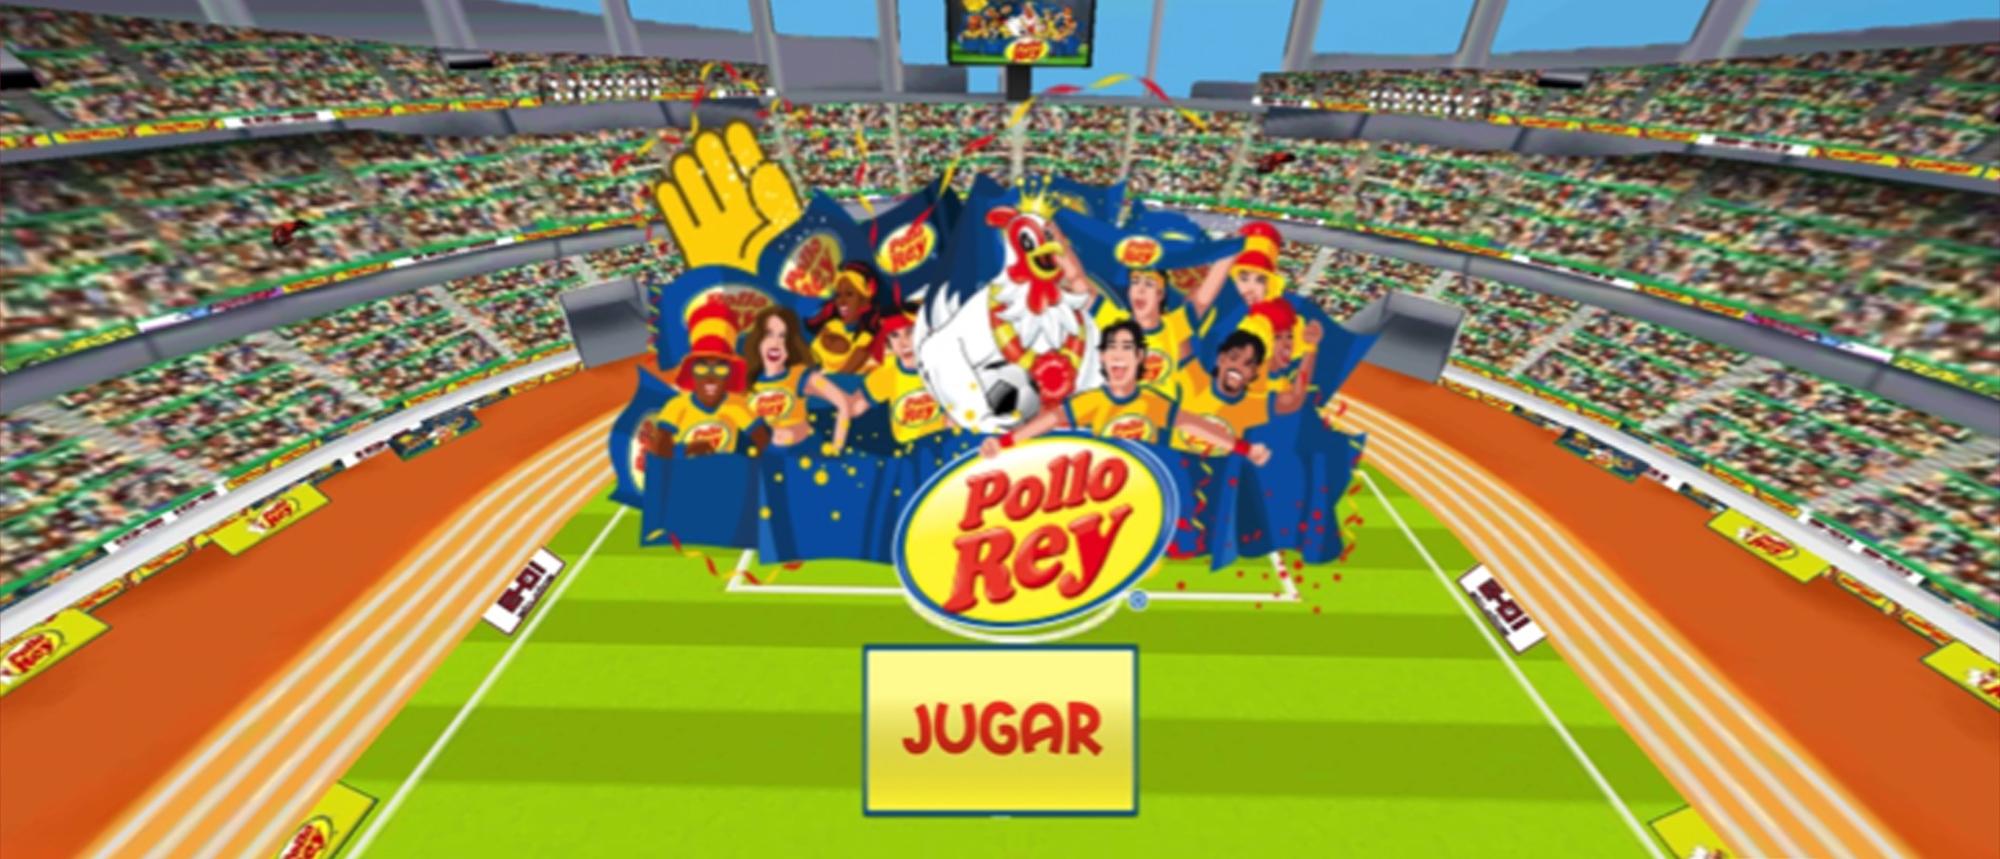 Pollo Rey® World Cup